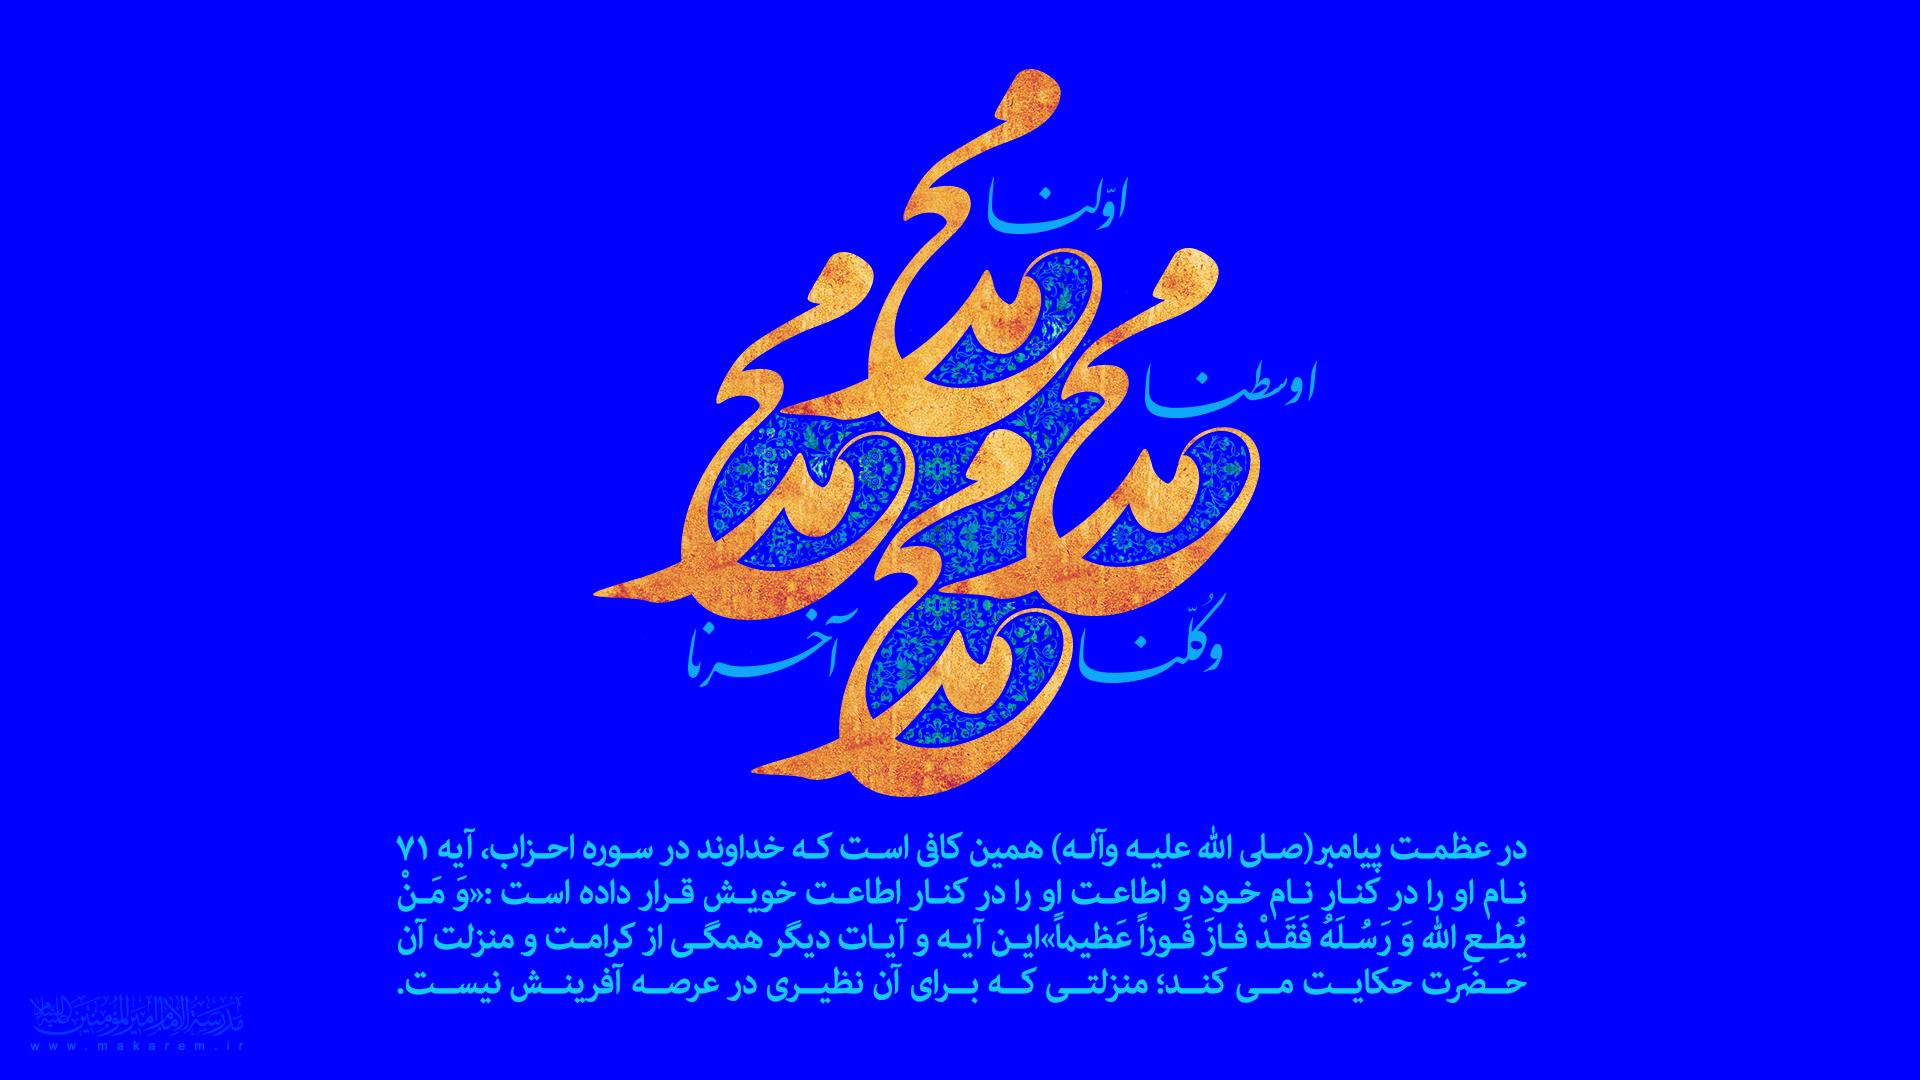 ولادت پیامبر 02-مدرسه الامام امیر المومنین (ع)